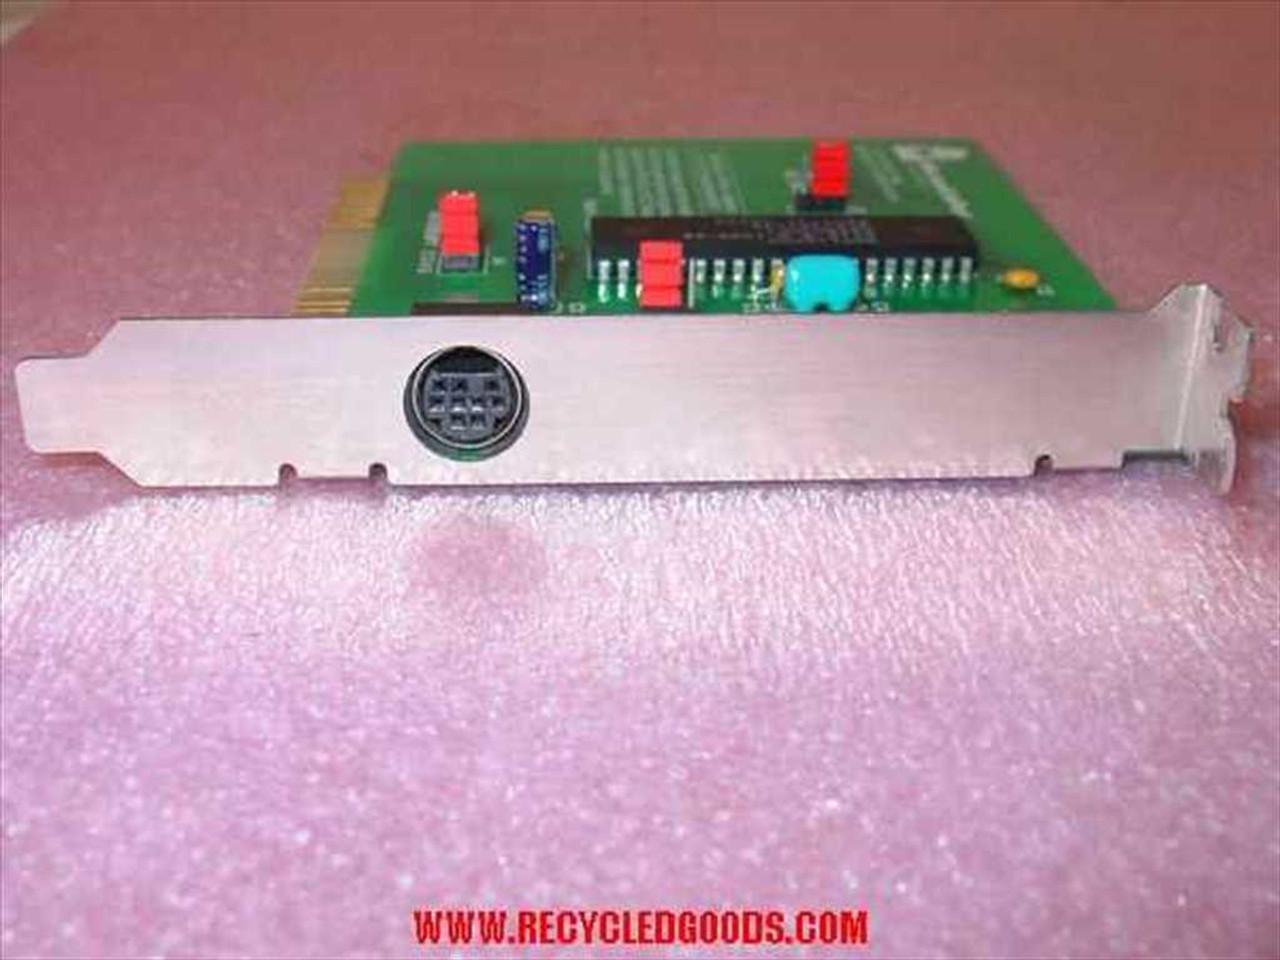 Microsoft InPort Mouse Device Interface Card 8-bit ISA//XT 900-255-018 Rev P